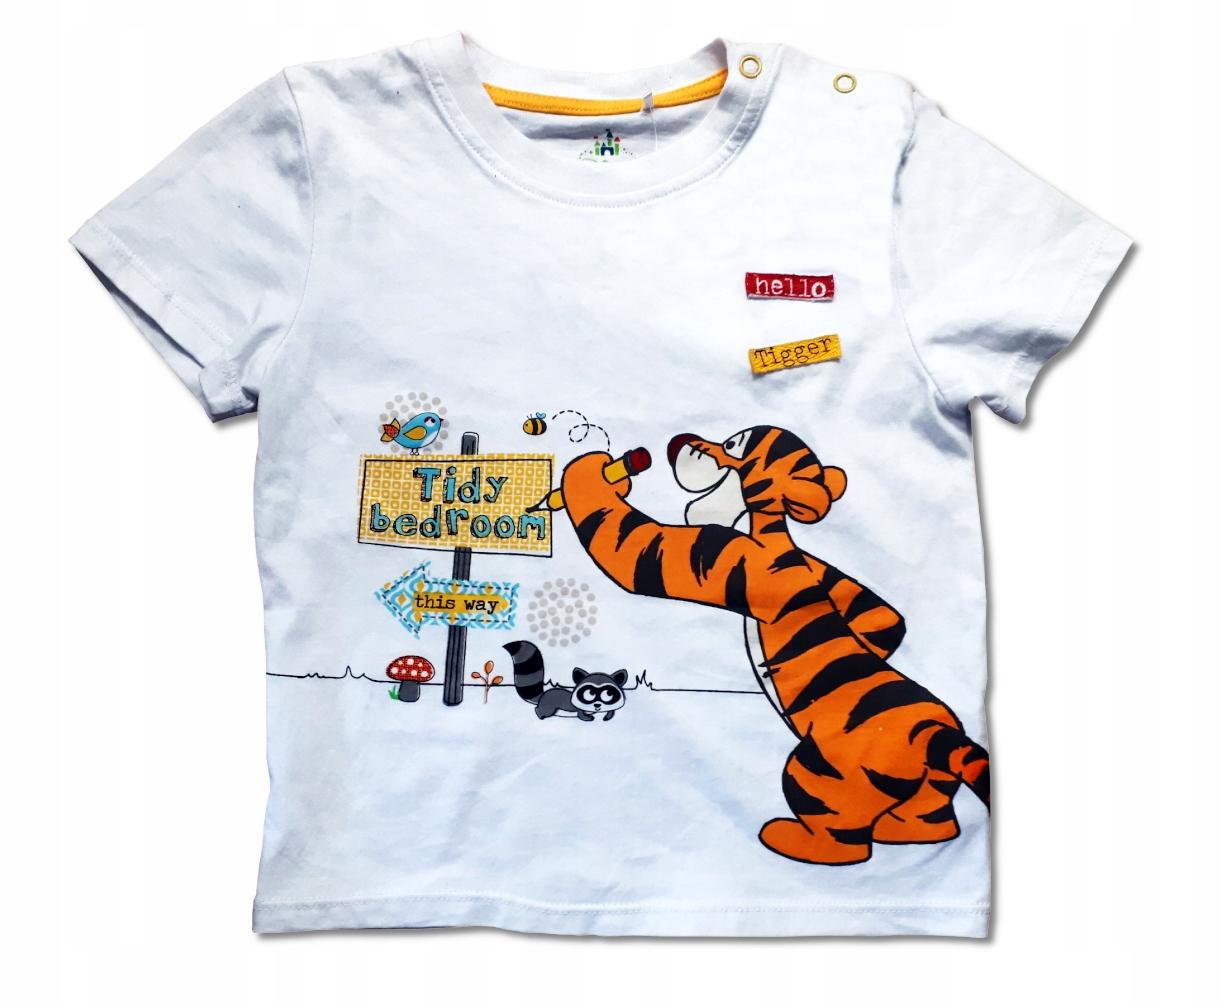 BLUZKA T-SHIRT Disney Tygrysek 86 12m+